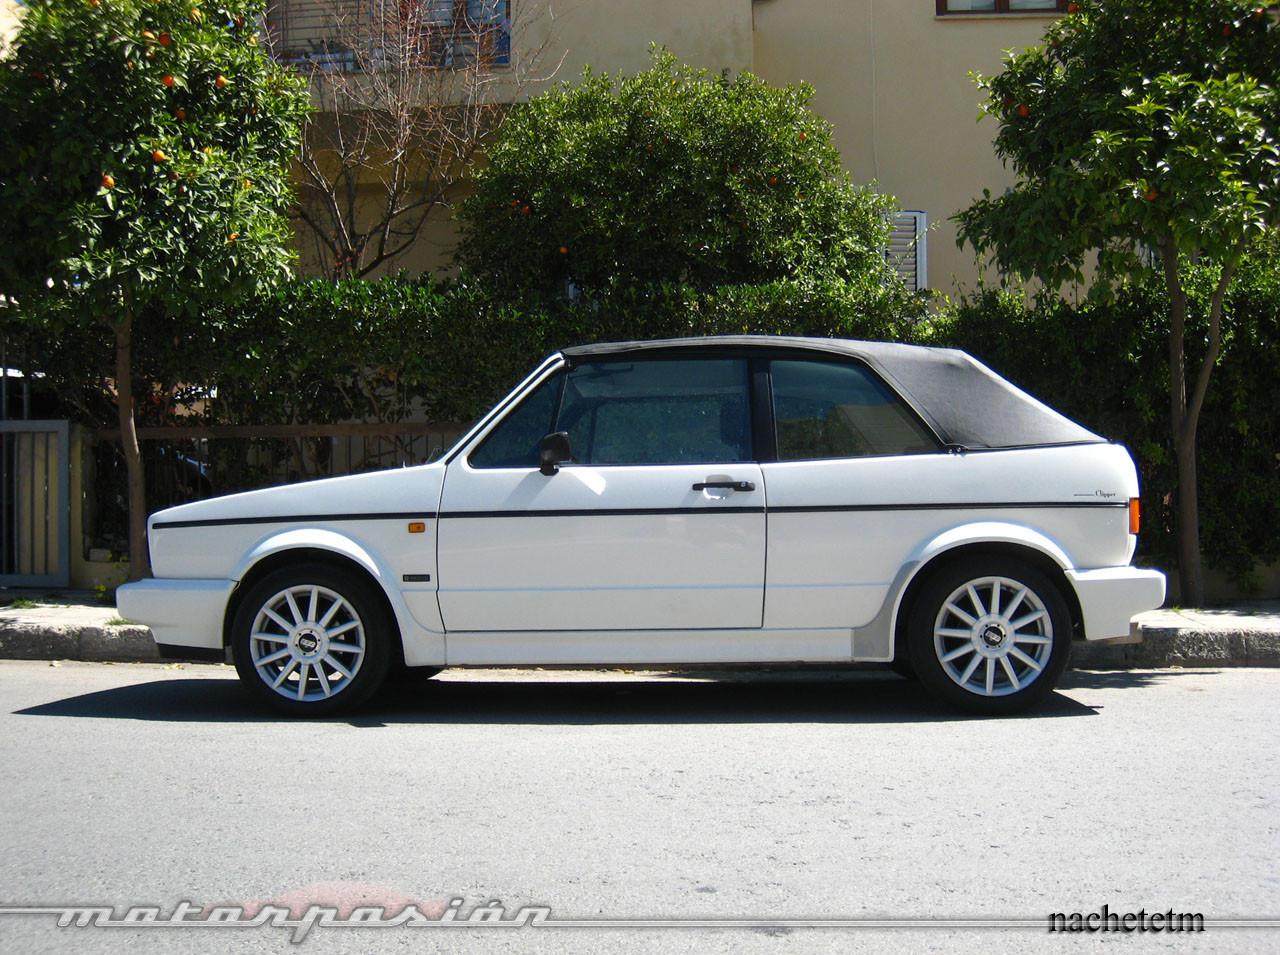 Foto de Volkswagen Golf Cabriolet Clipper (1992) (8/10)